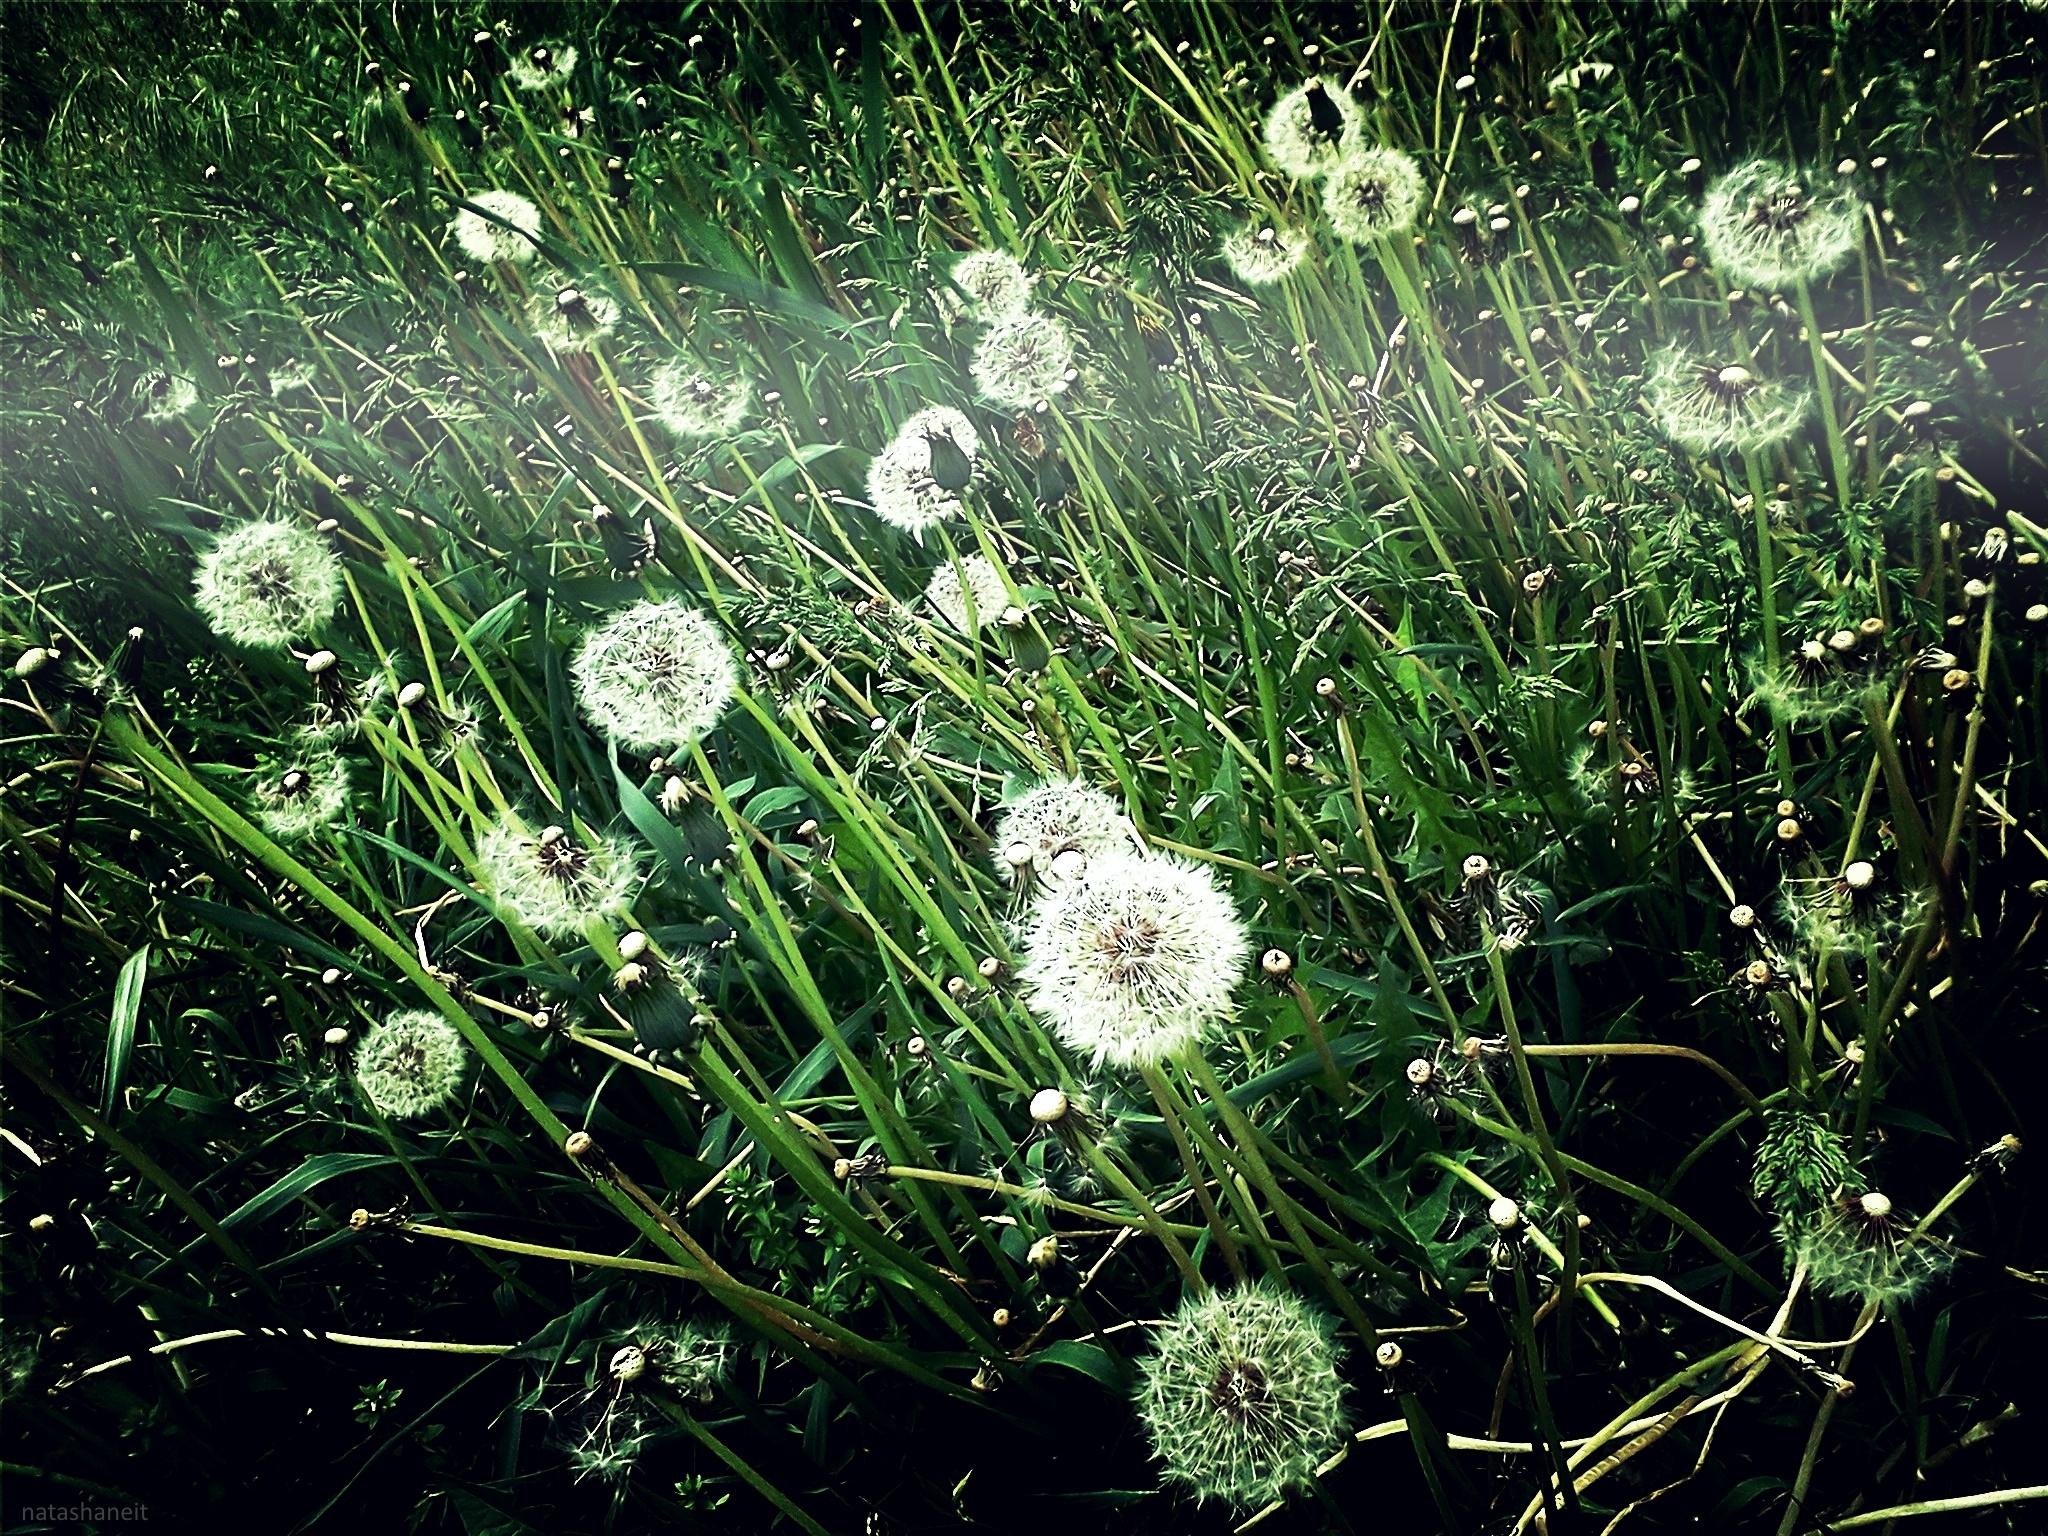 Glade of dandelions by natashaneit